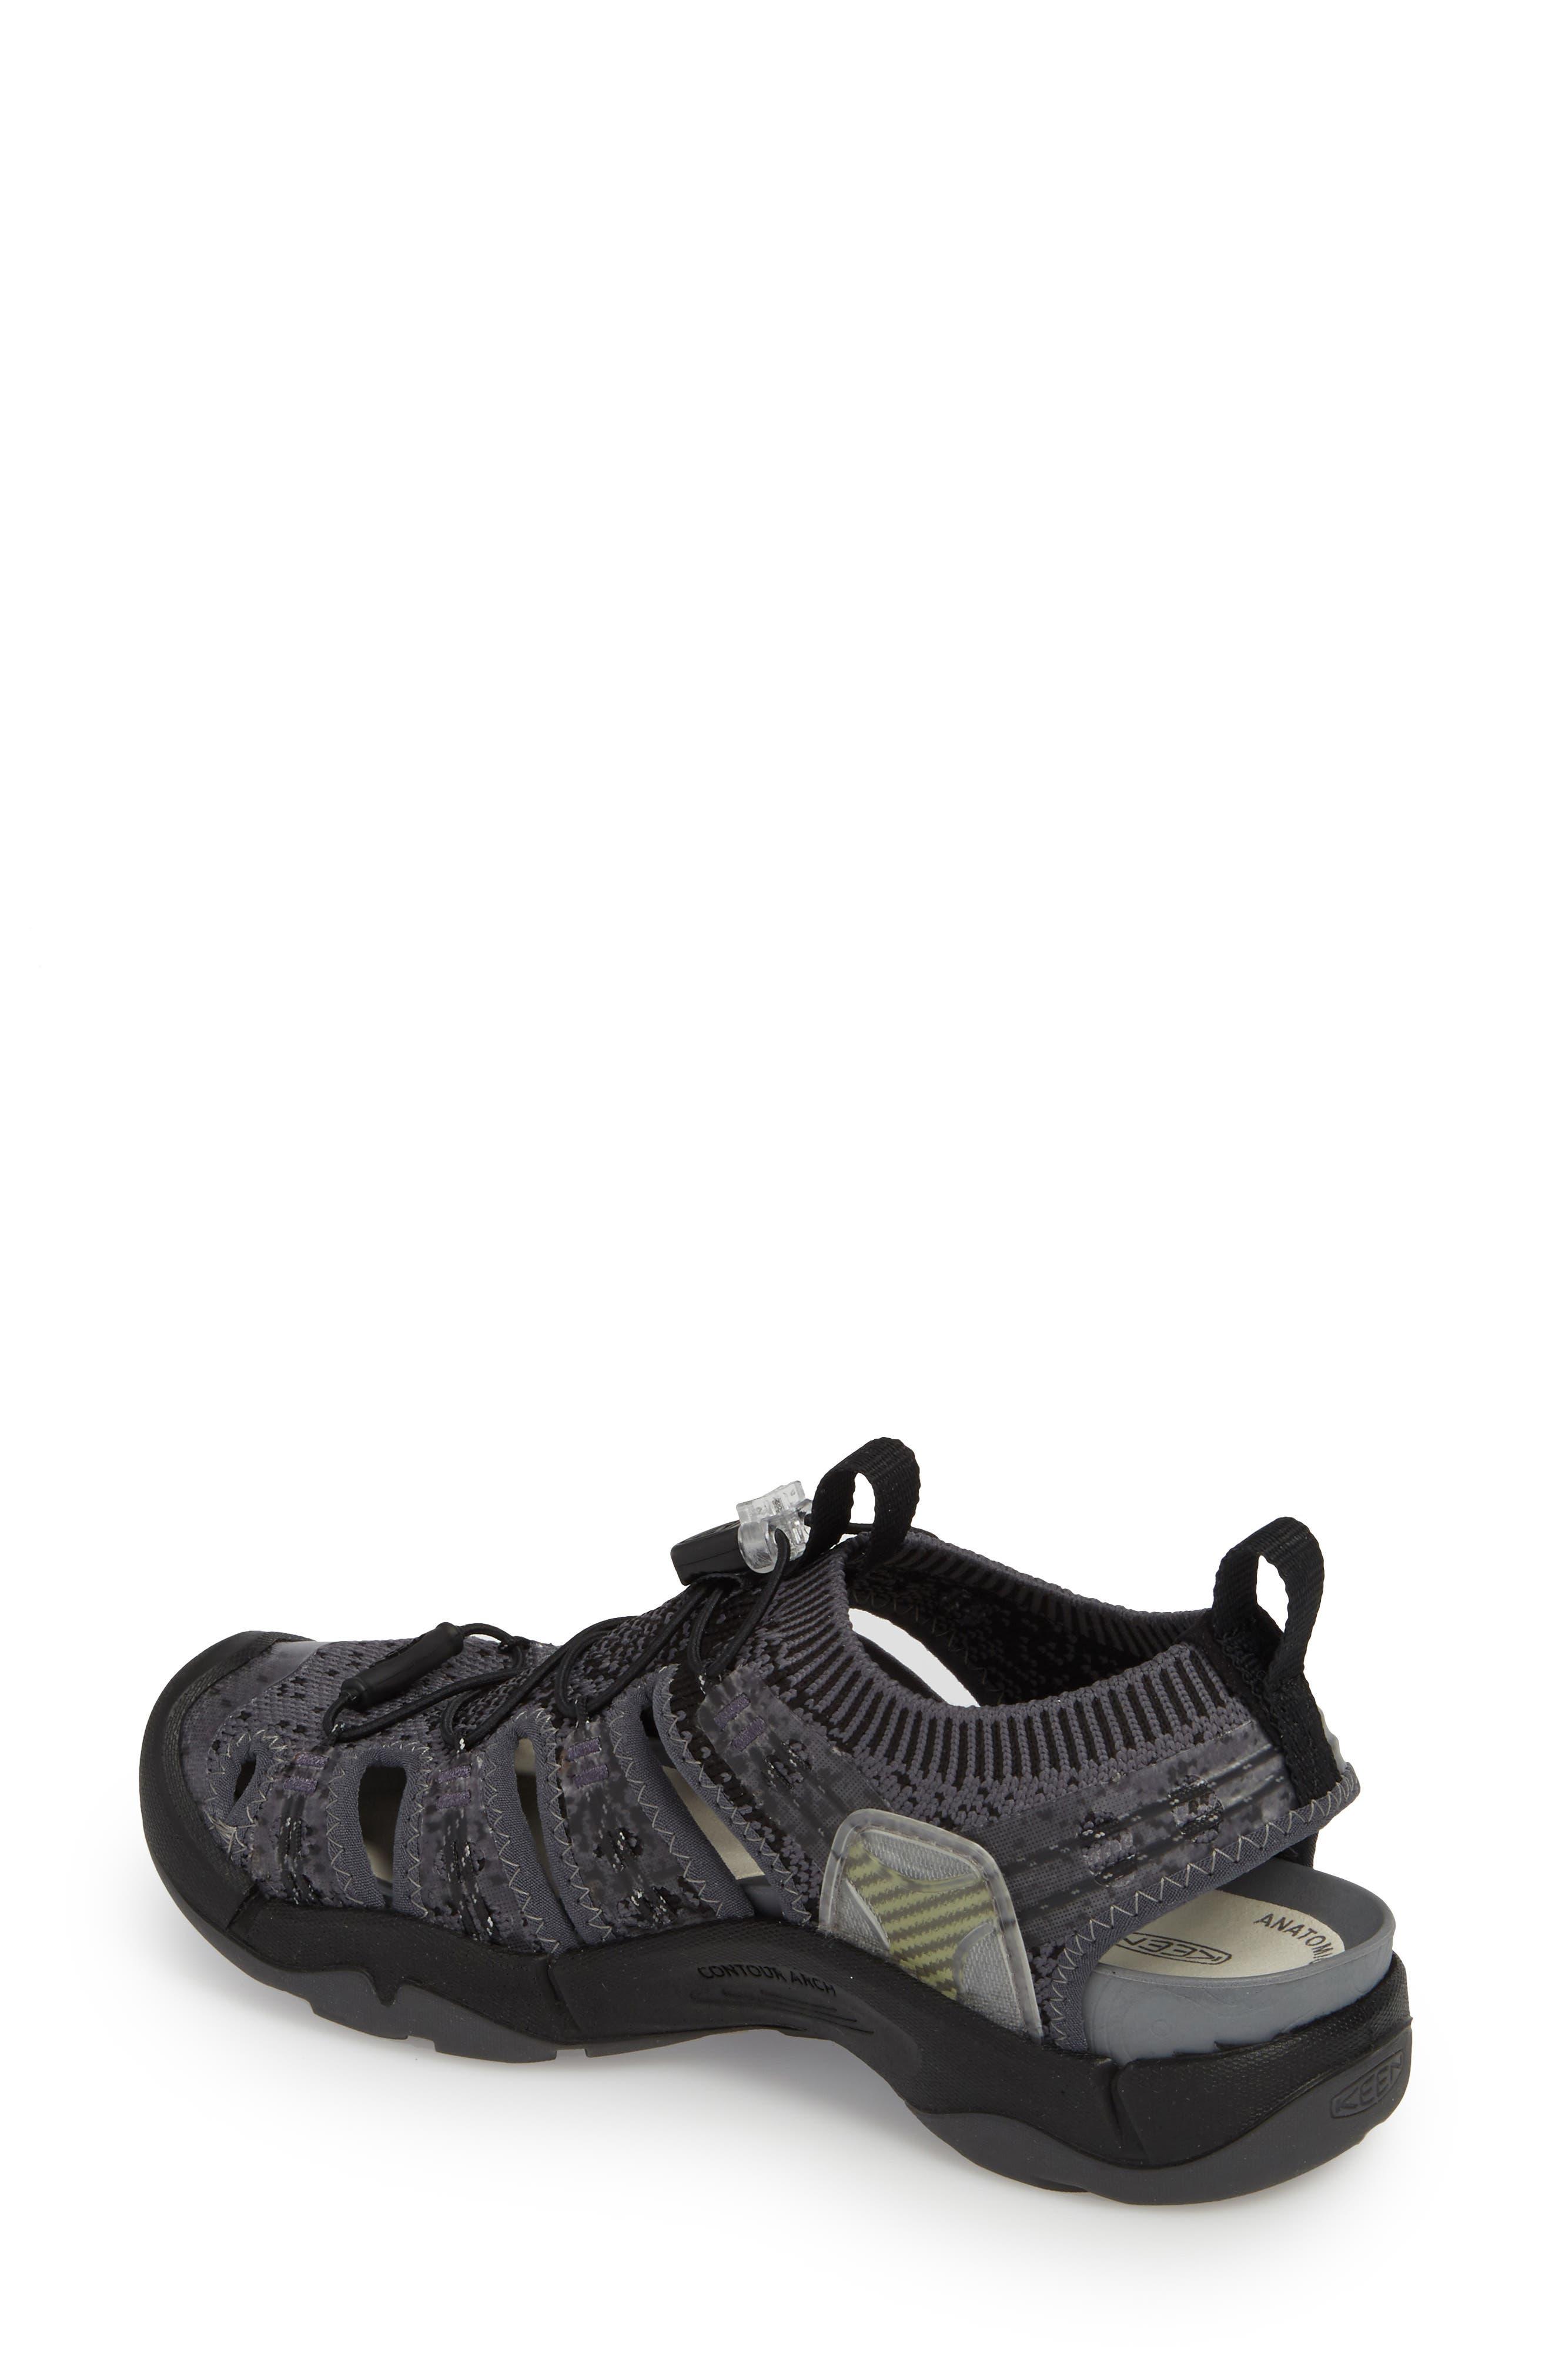 EVOFIT One Sandal,                             Alternate thumbnail 2, color,                             Heathered Black/ Magnet